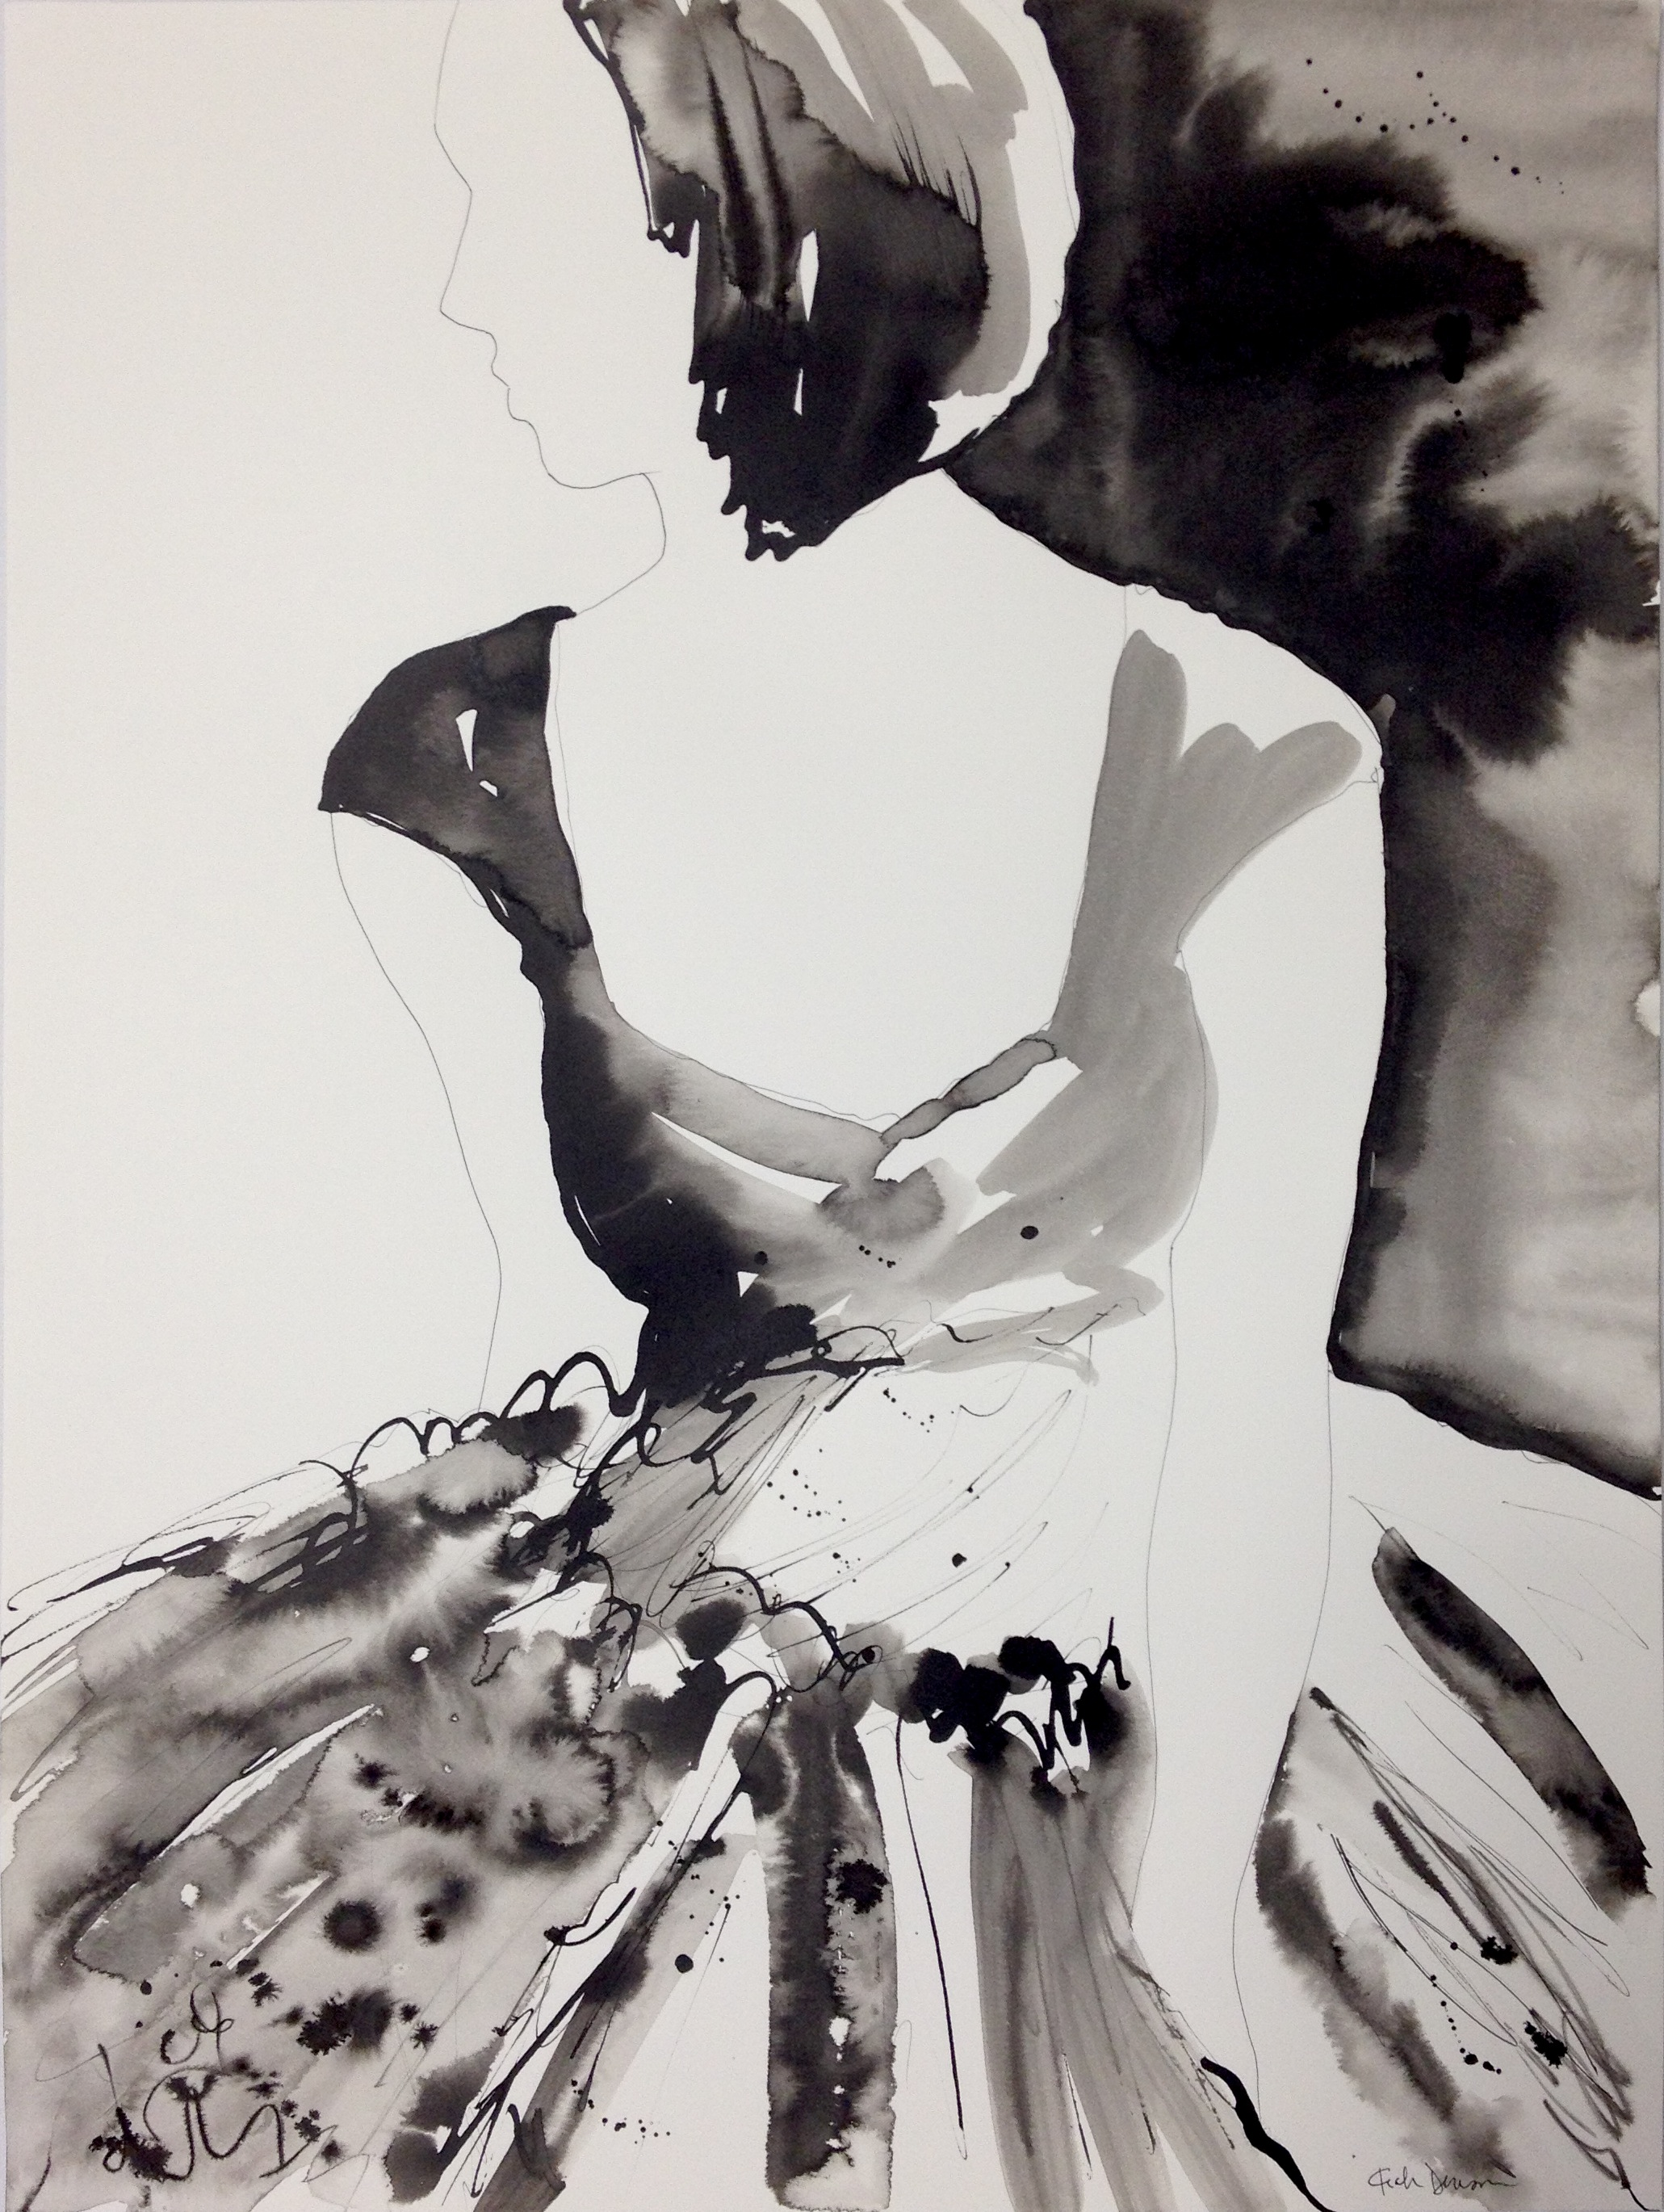 Silhouette #2